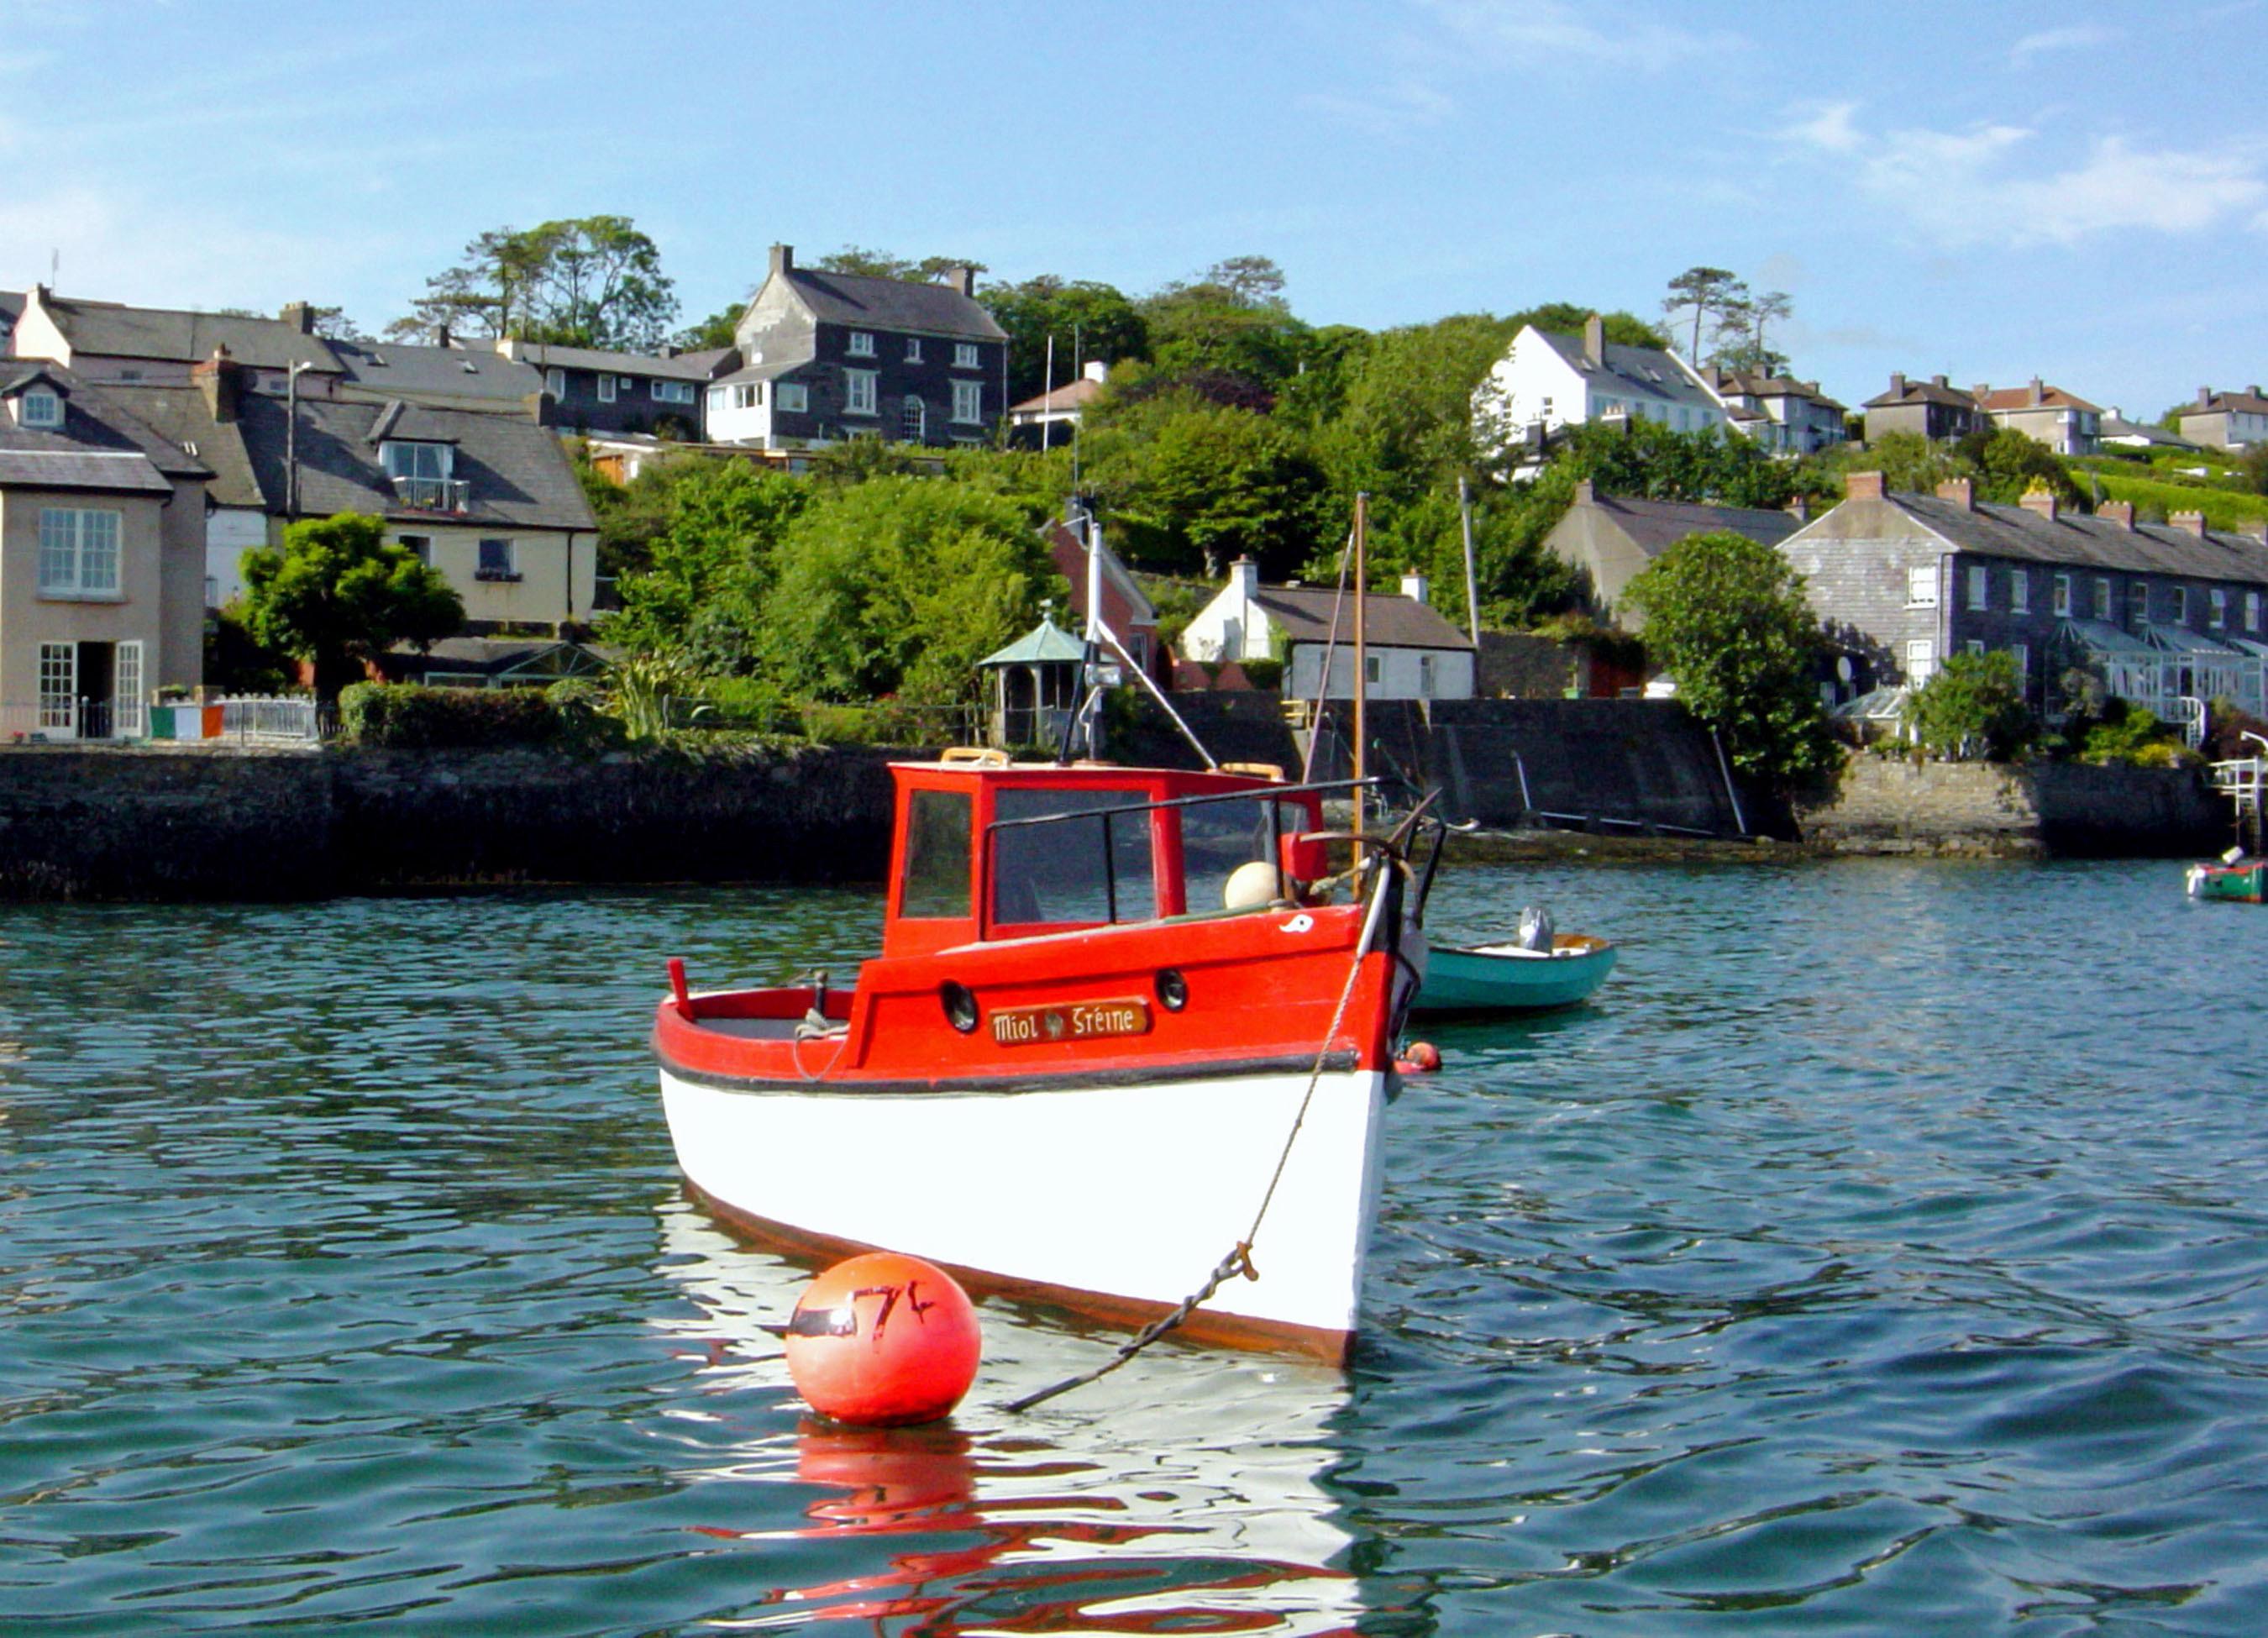 AUG12 Kinsale Fishing Boat